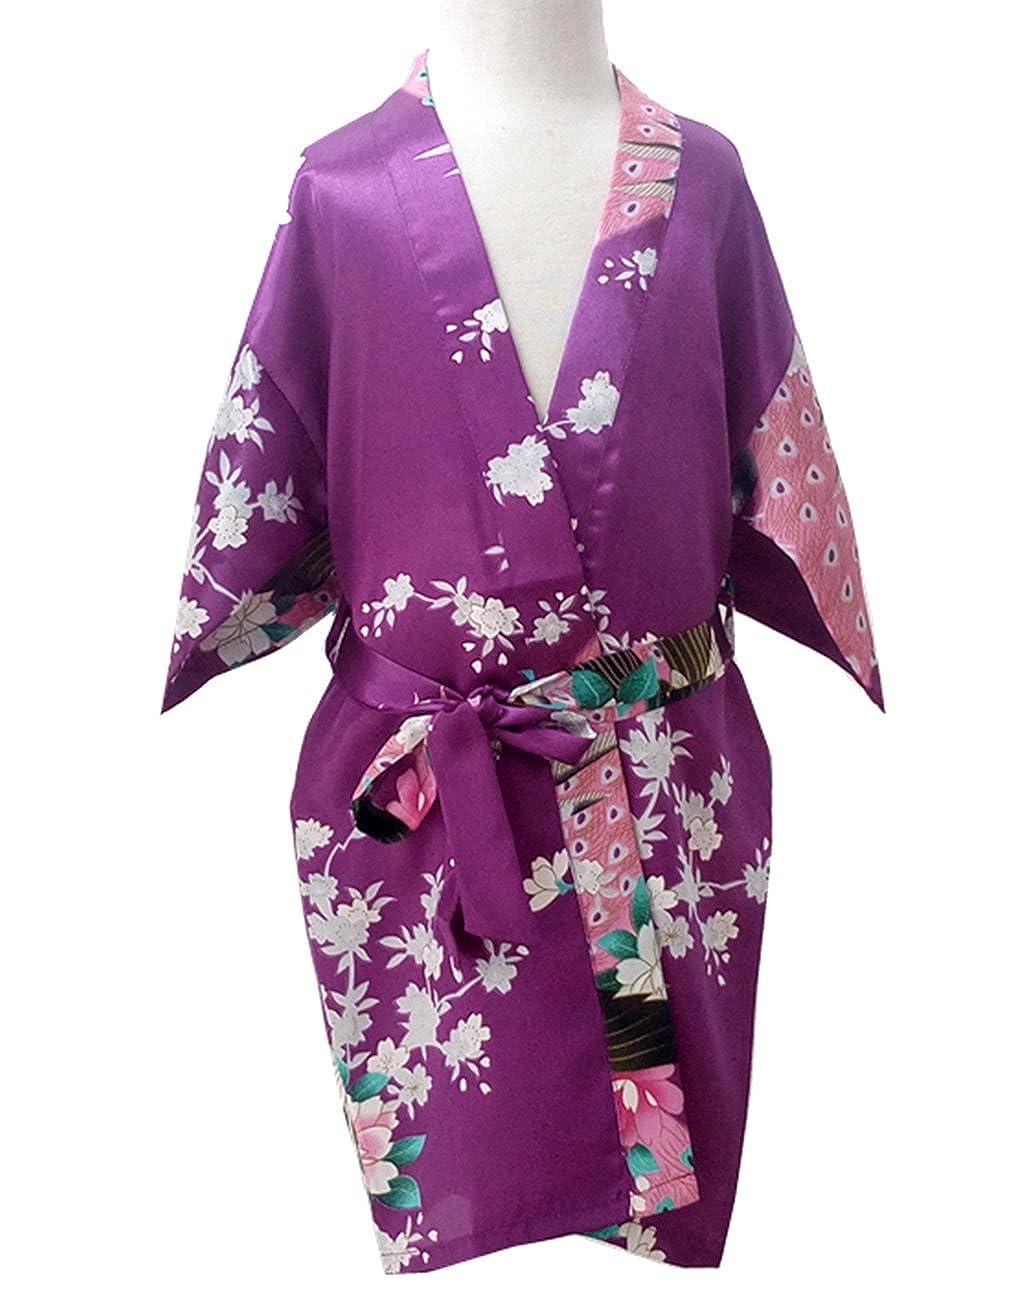 Opkelana Girls Stain Silk Kimono Peacock and Blossoms Sleepwear Robe Bathrobe